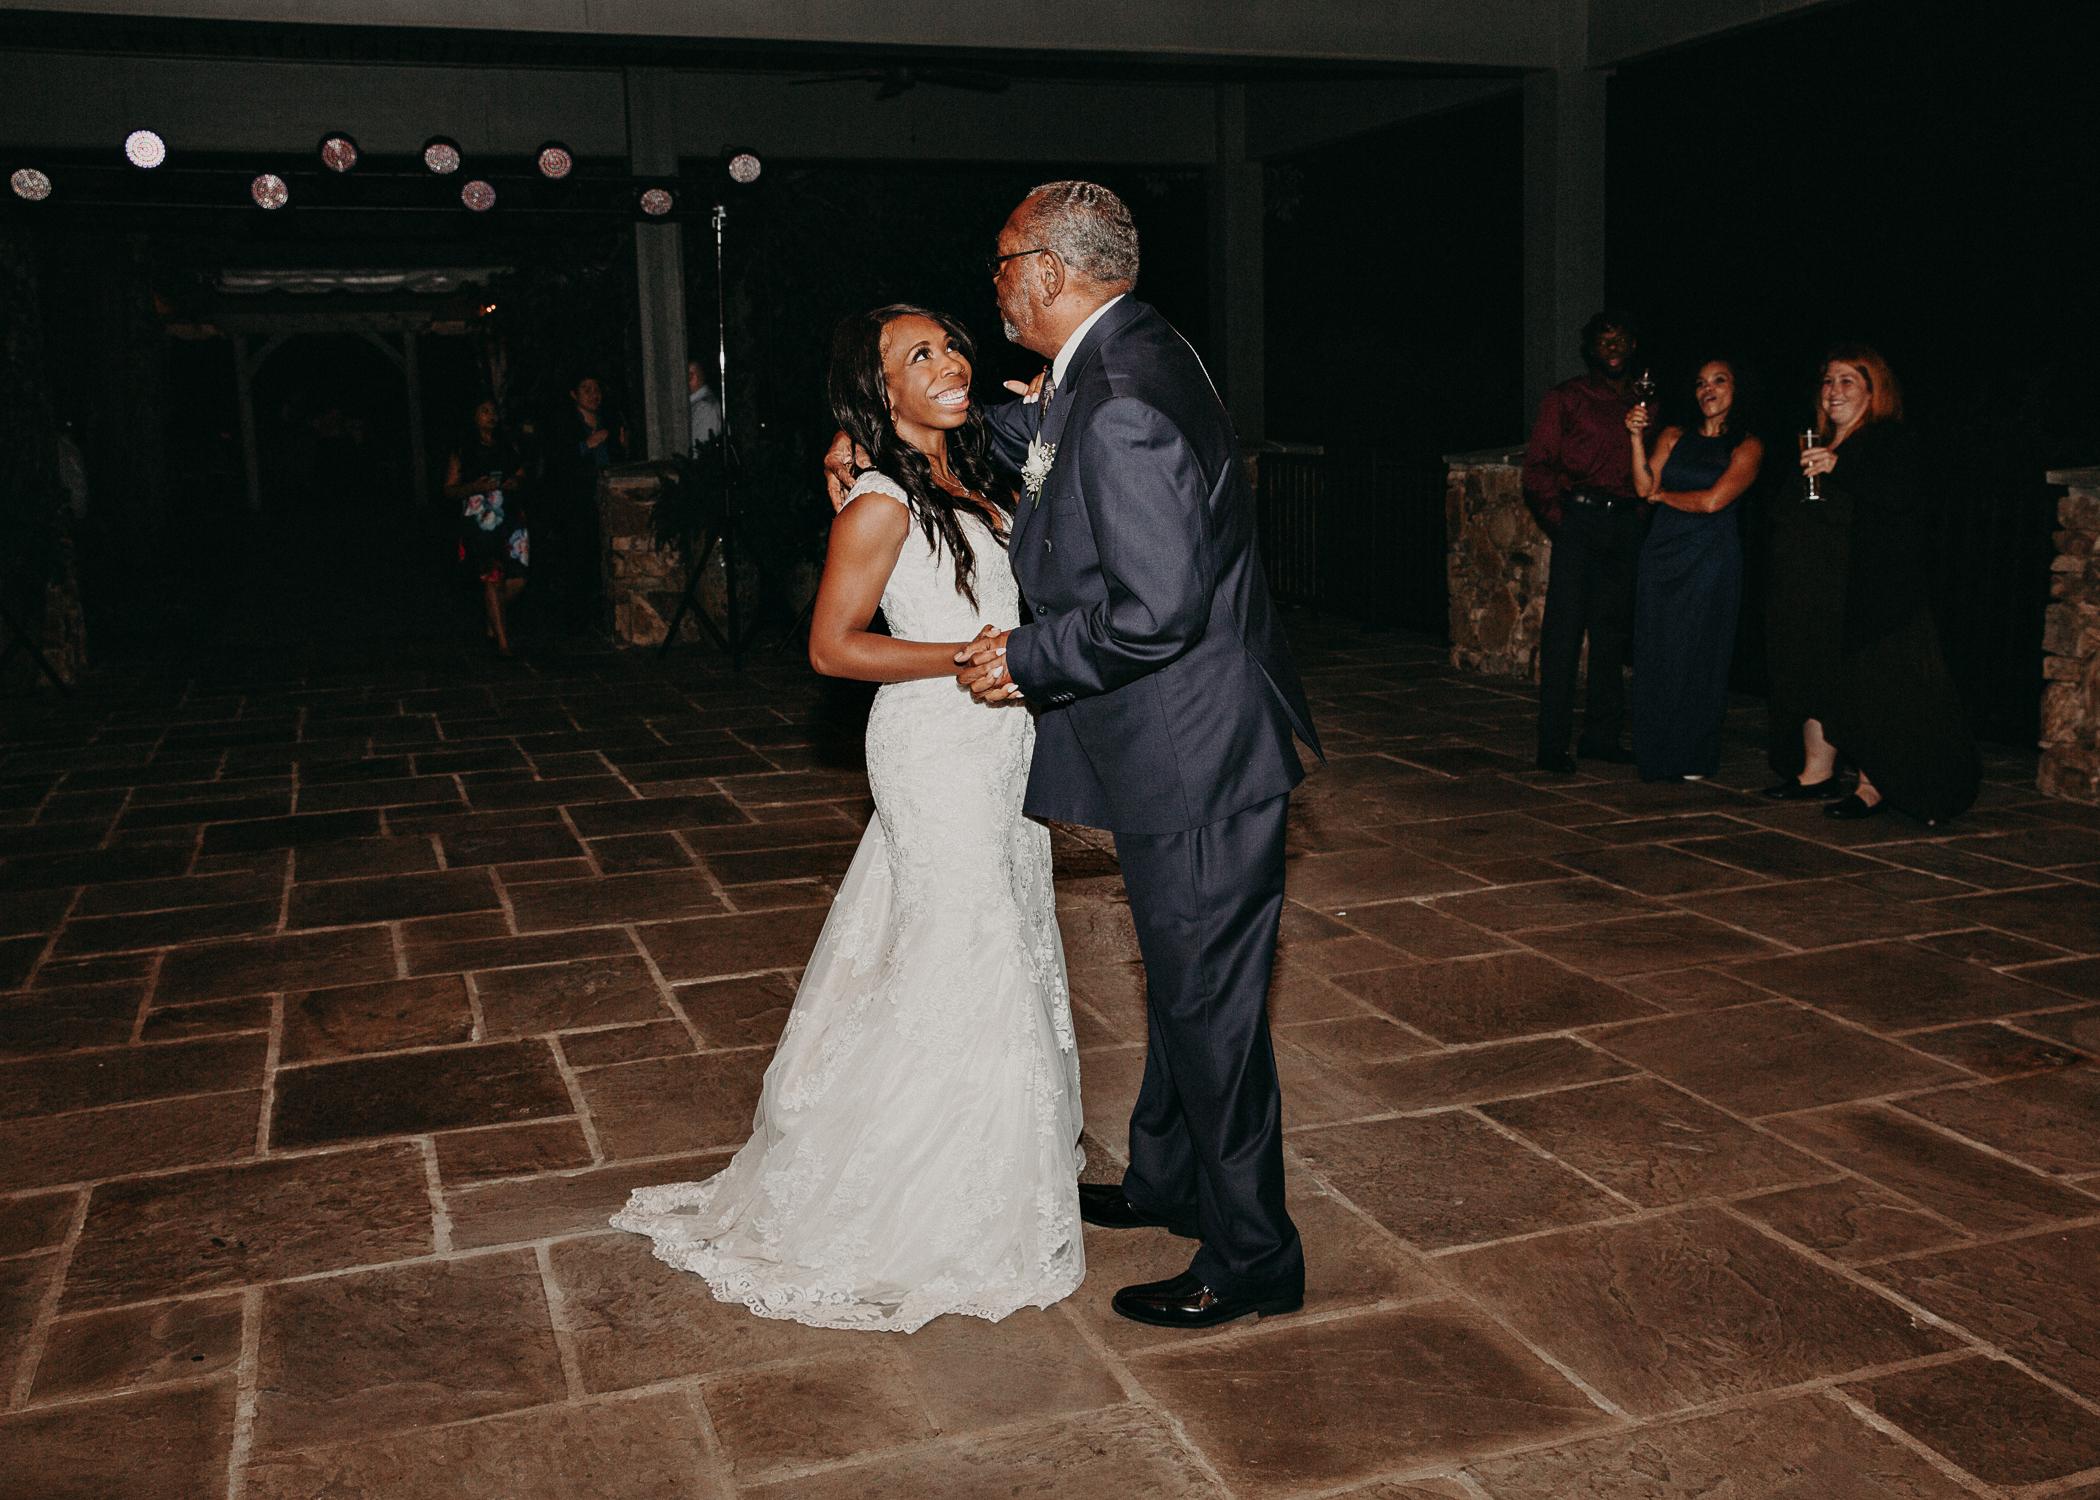 91- Kaya_vineyard_dahlonega_wedding_venue_detais_reception_aline_marin_photography.jpg